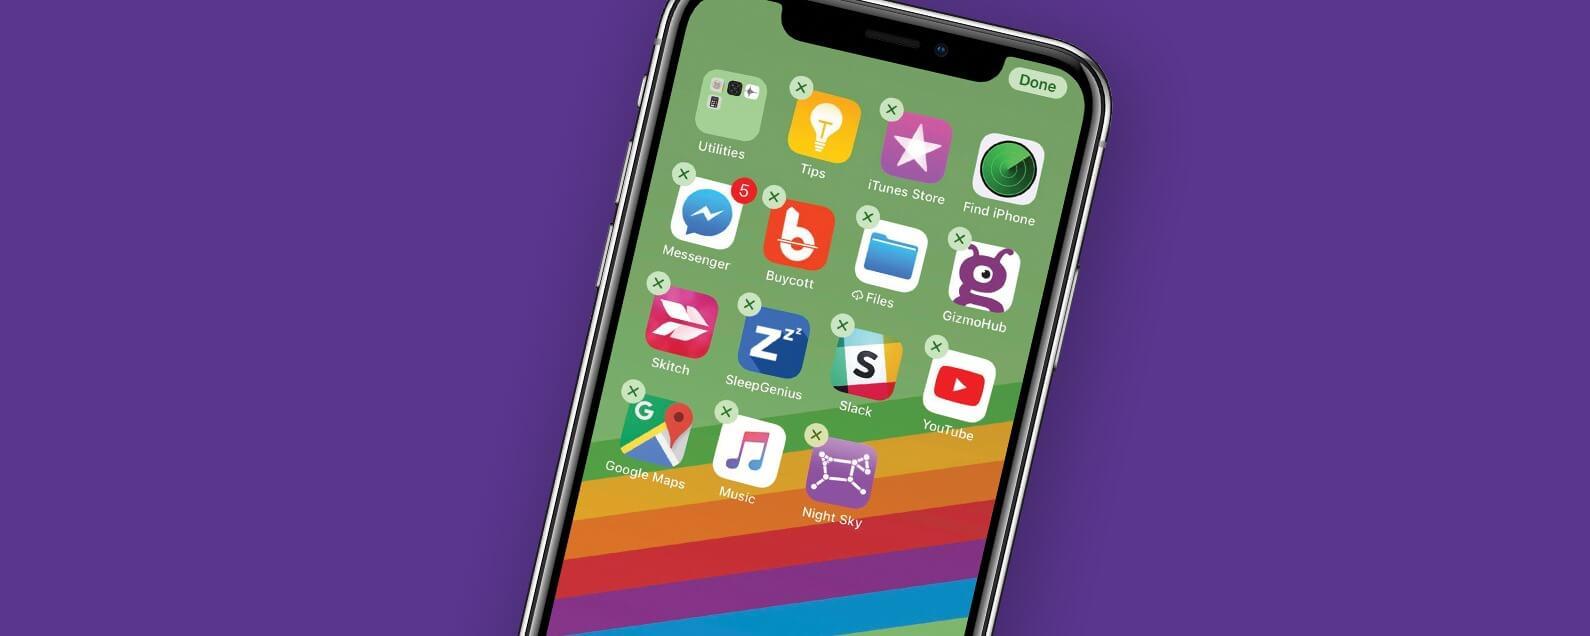 Вам может хватить 30 приложений на iPhone. Попробуйте